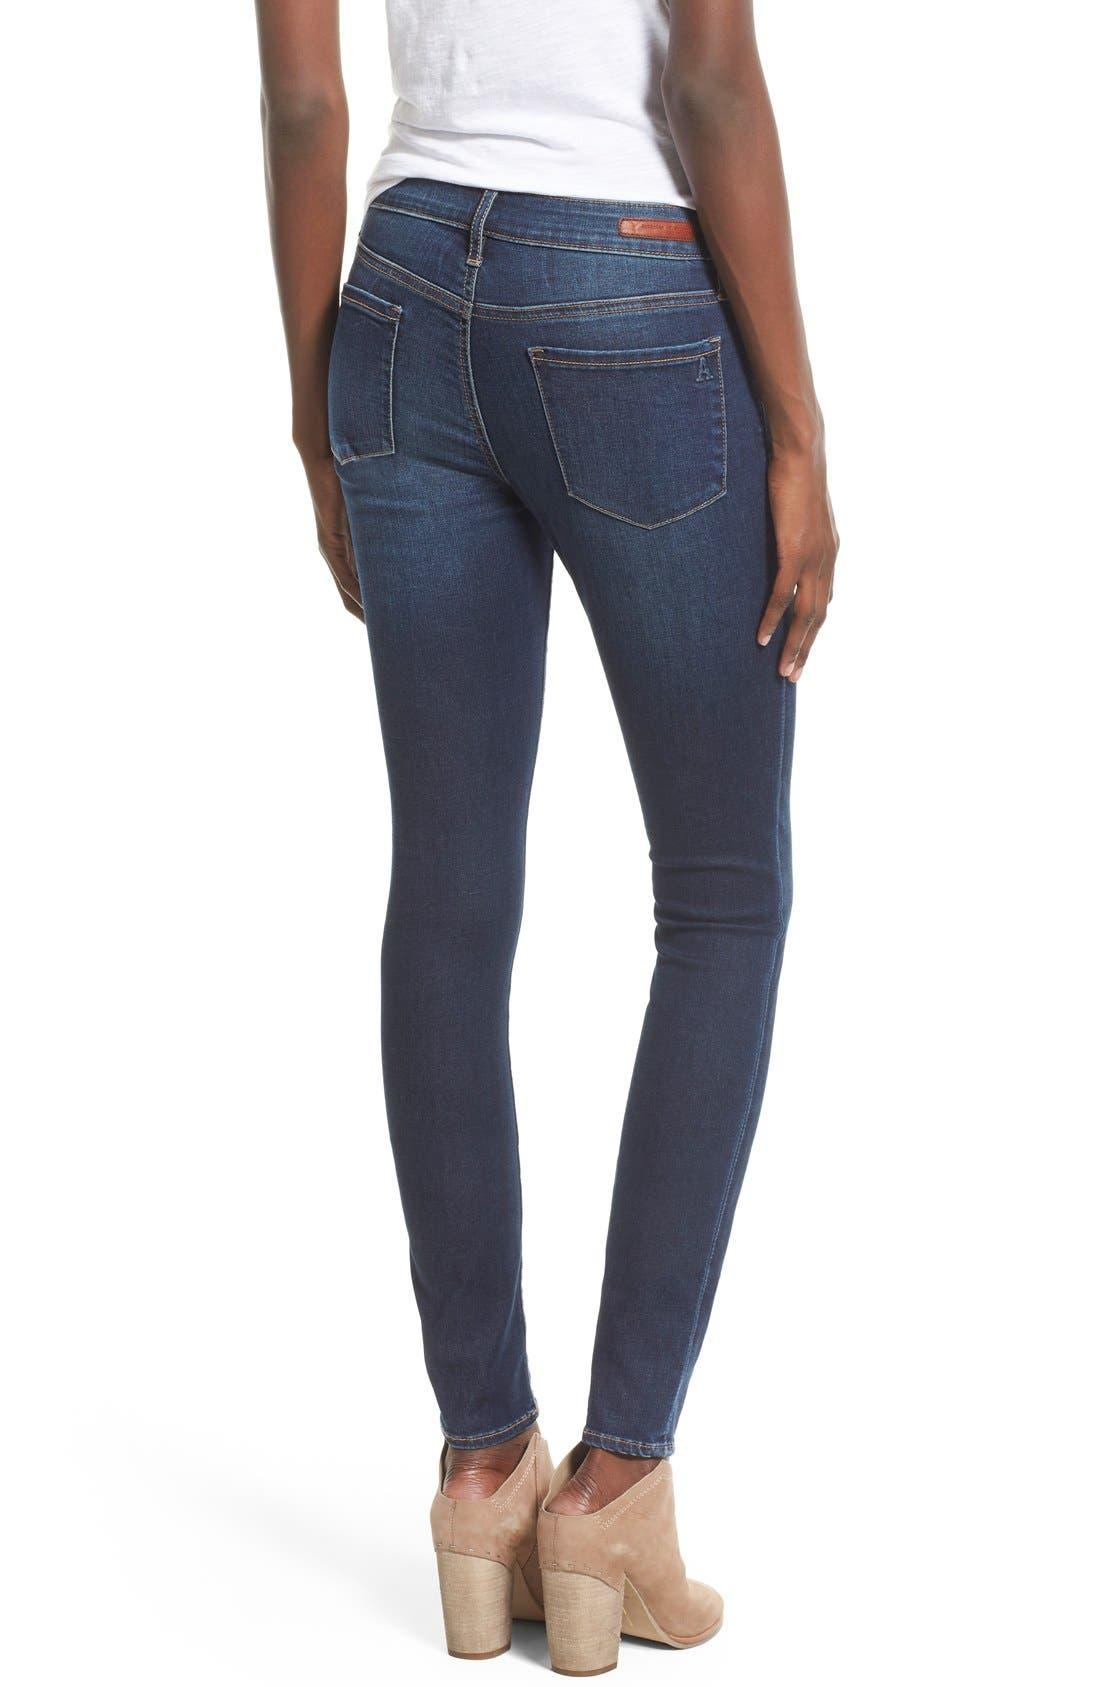 Alternate Image 2  - Articles of Society 'Mya' Skinny Jeans (Tahoe)